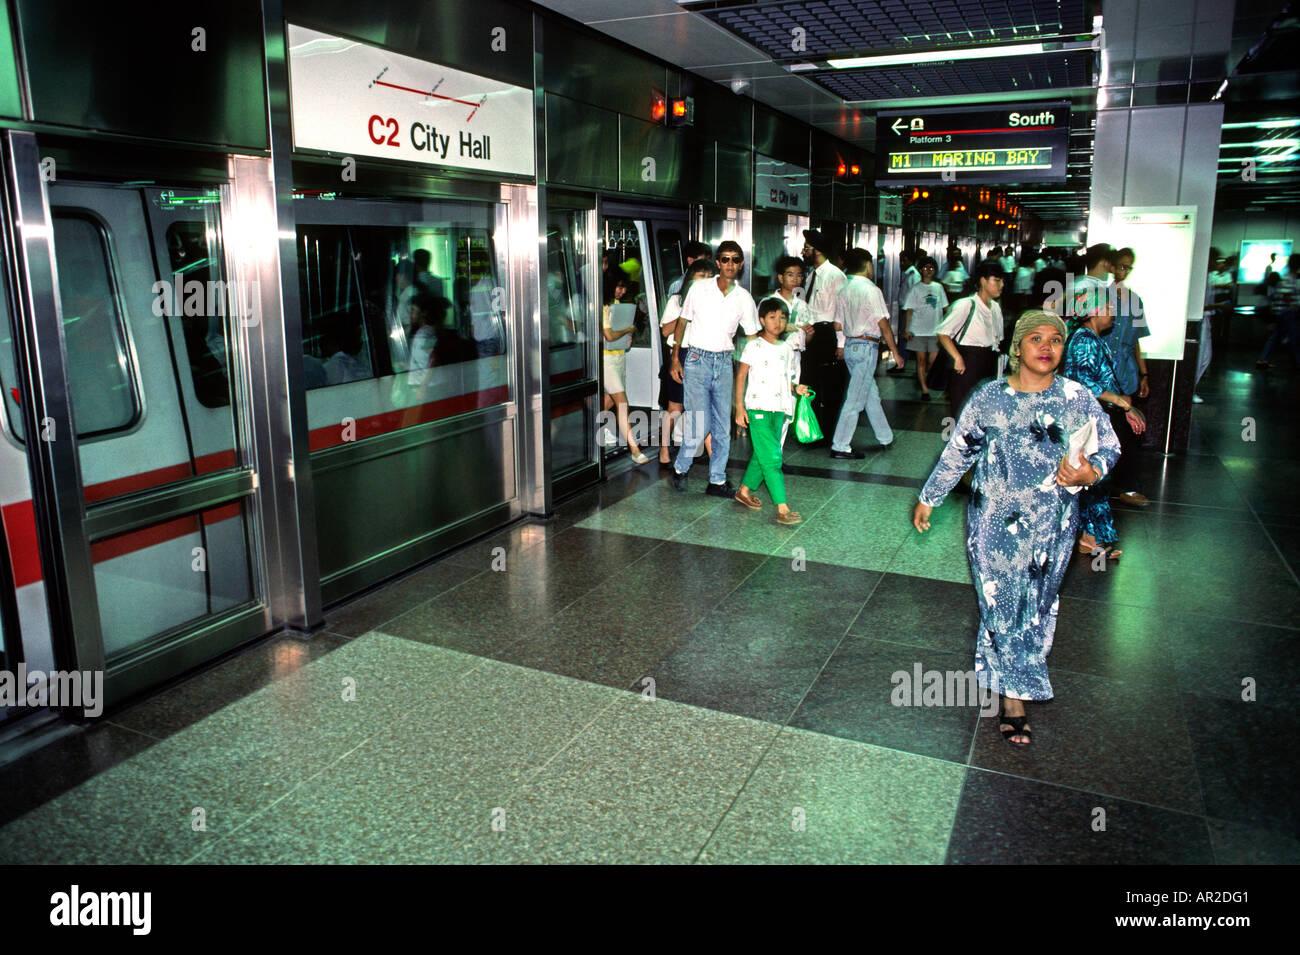 Singapore Transport City Hall Station Passengers Leaving Train Mass Rapid Transit System Stock Photo Alamy